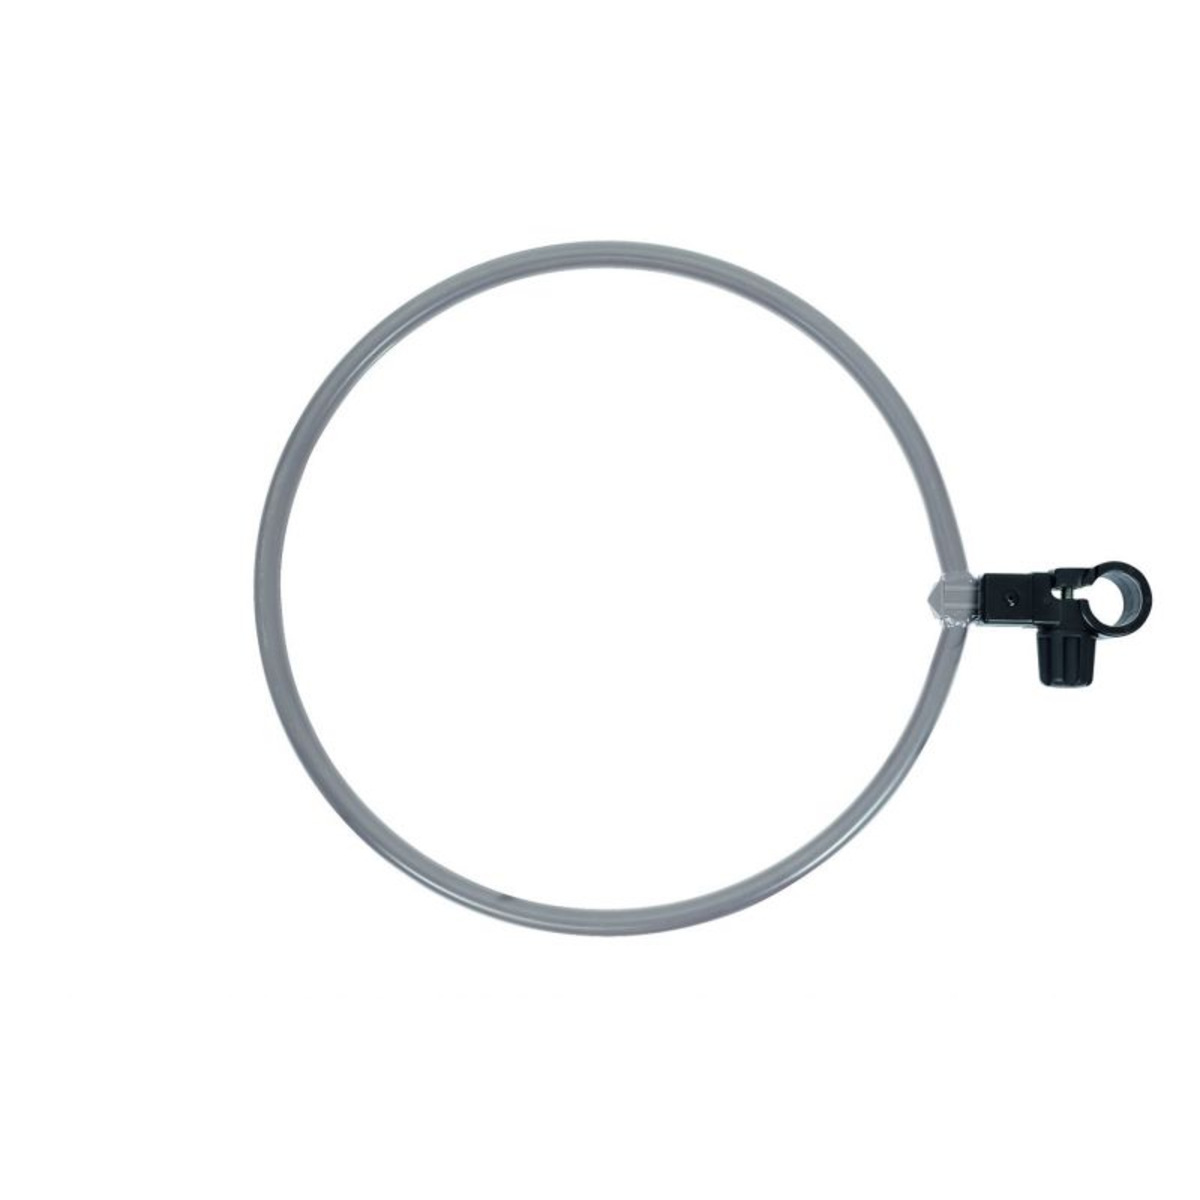 Colmic Aluminium Ring Klammer Einzeln - Durchmesser 33 cm - Eimer 12 lt - Schüssel 5 lt